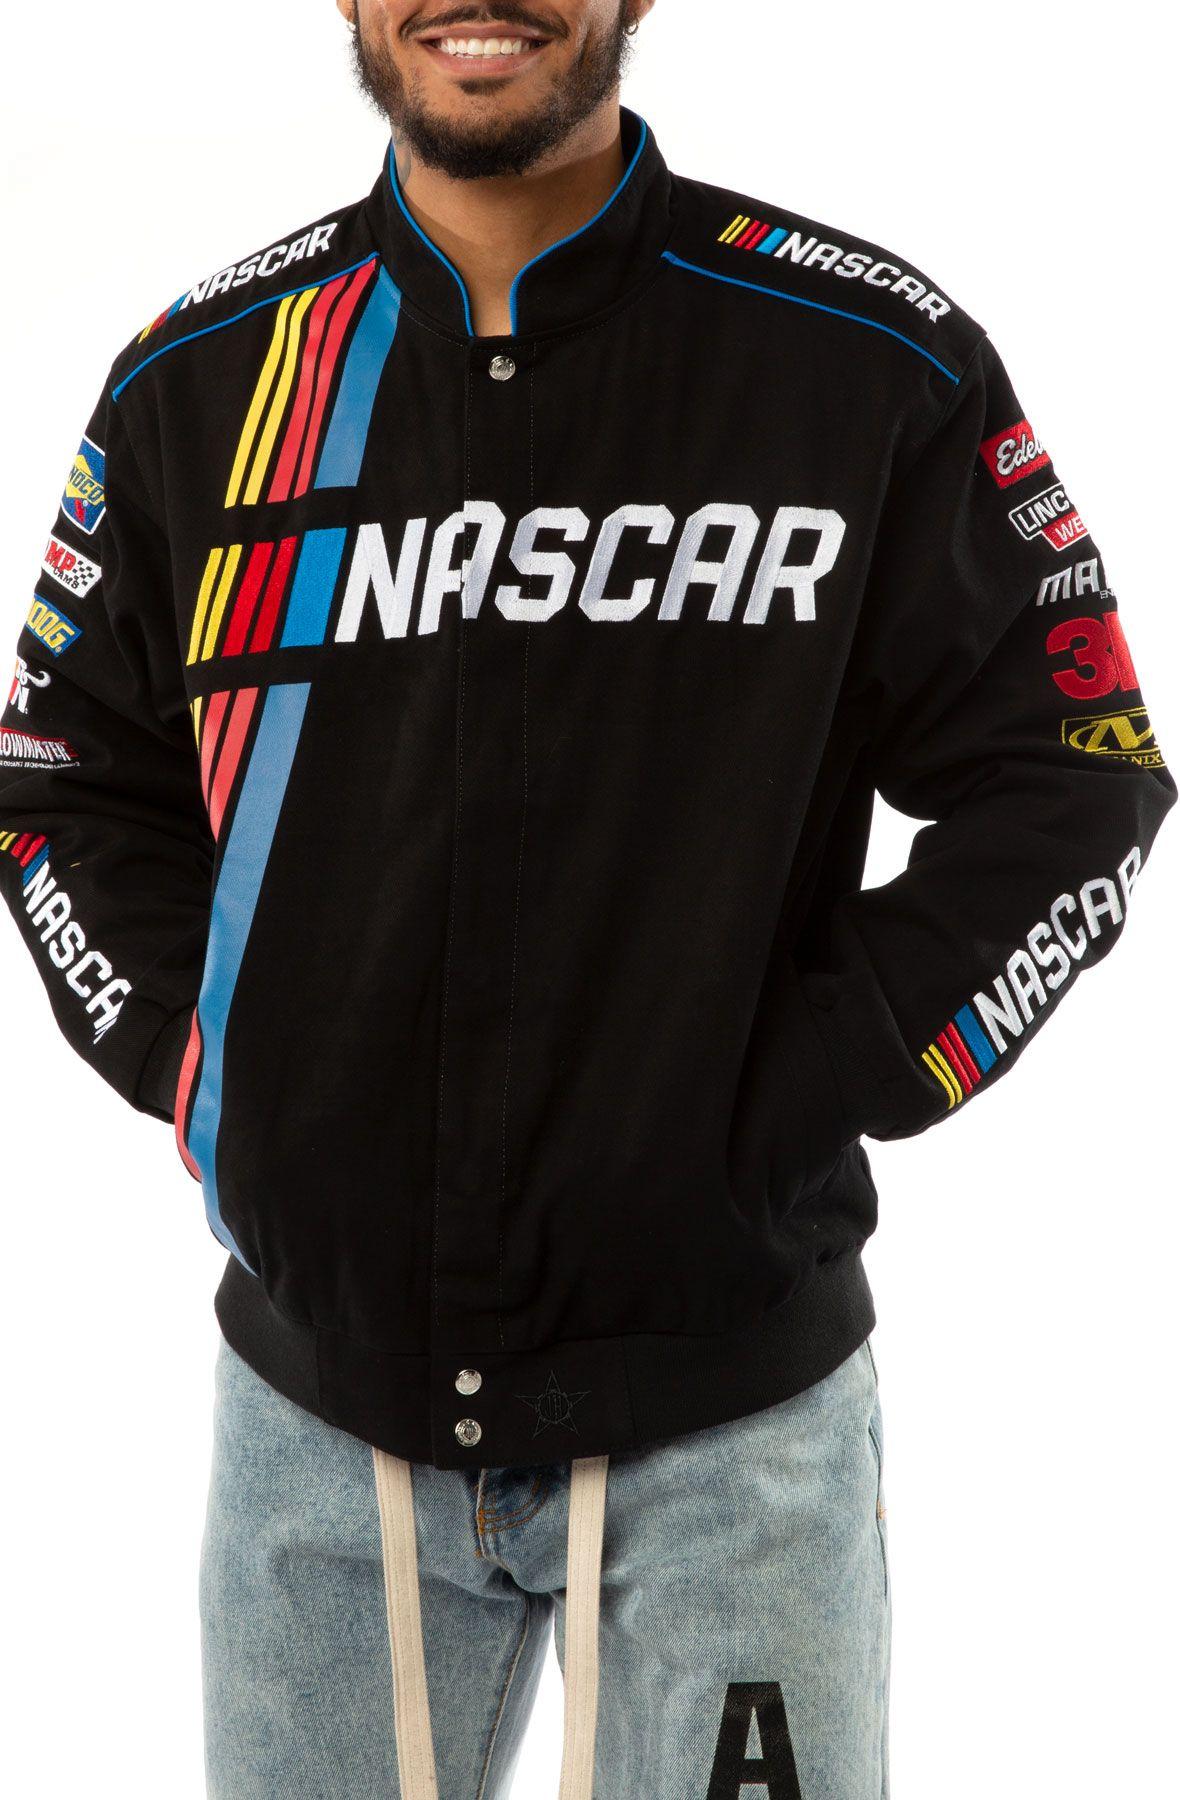 Nascar Racing Jacket